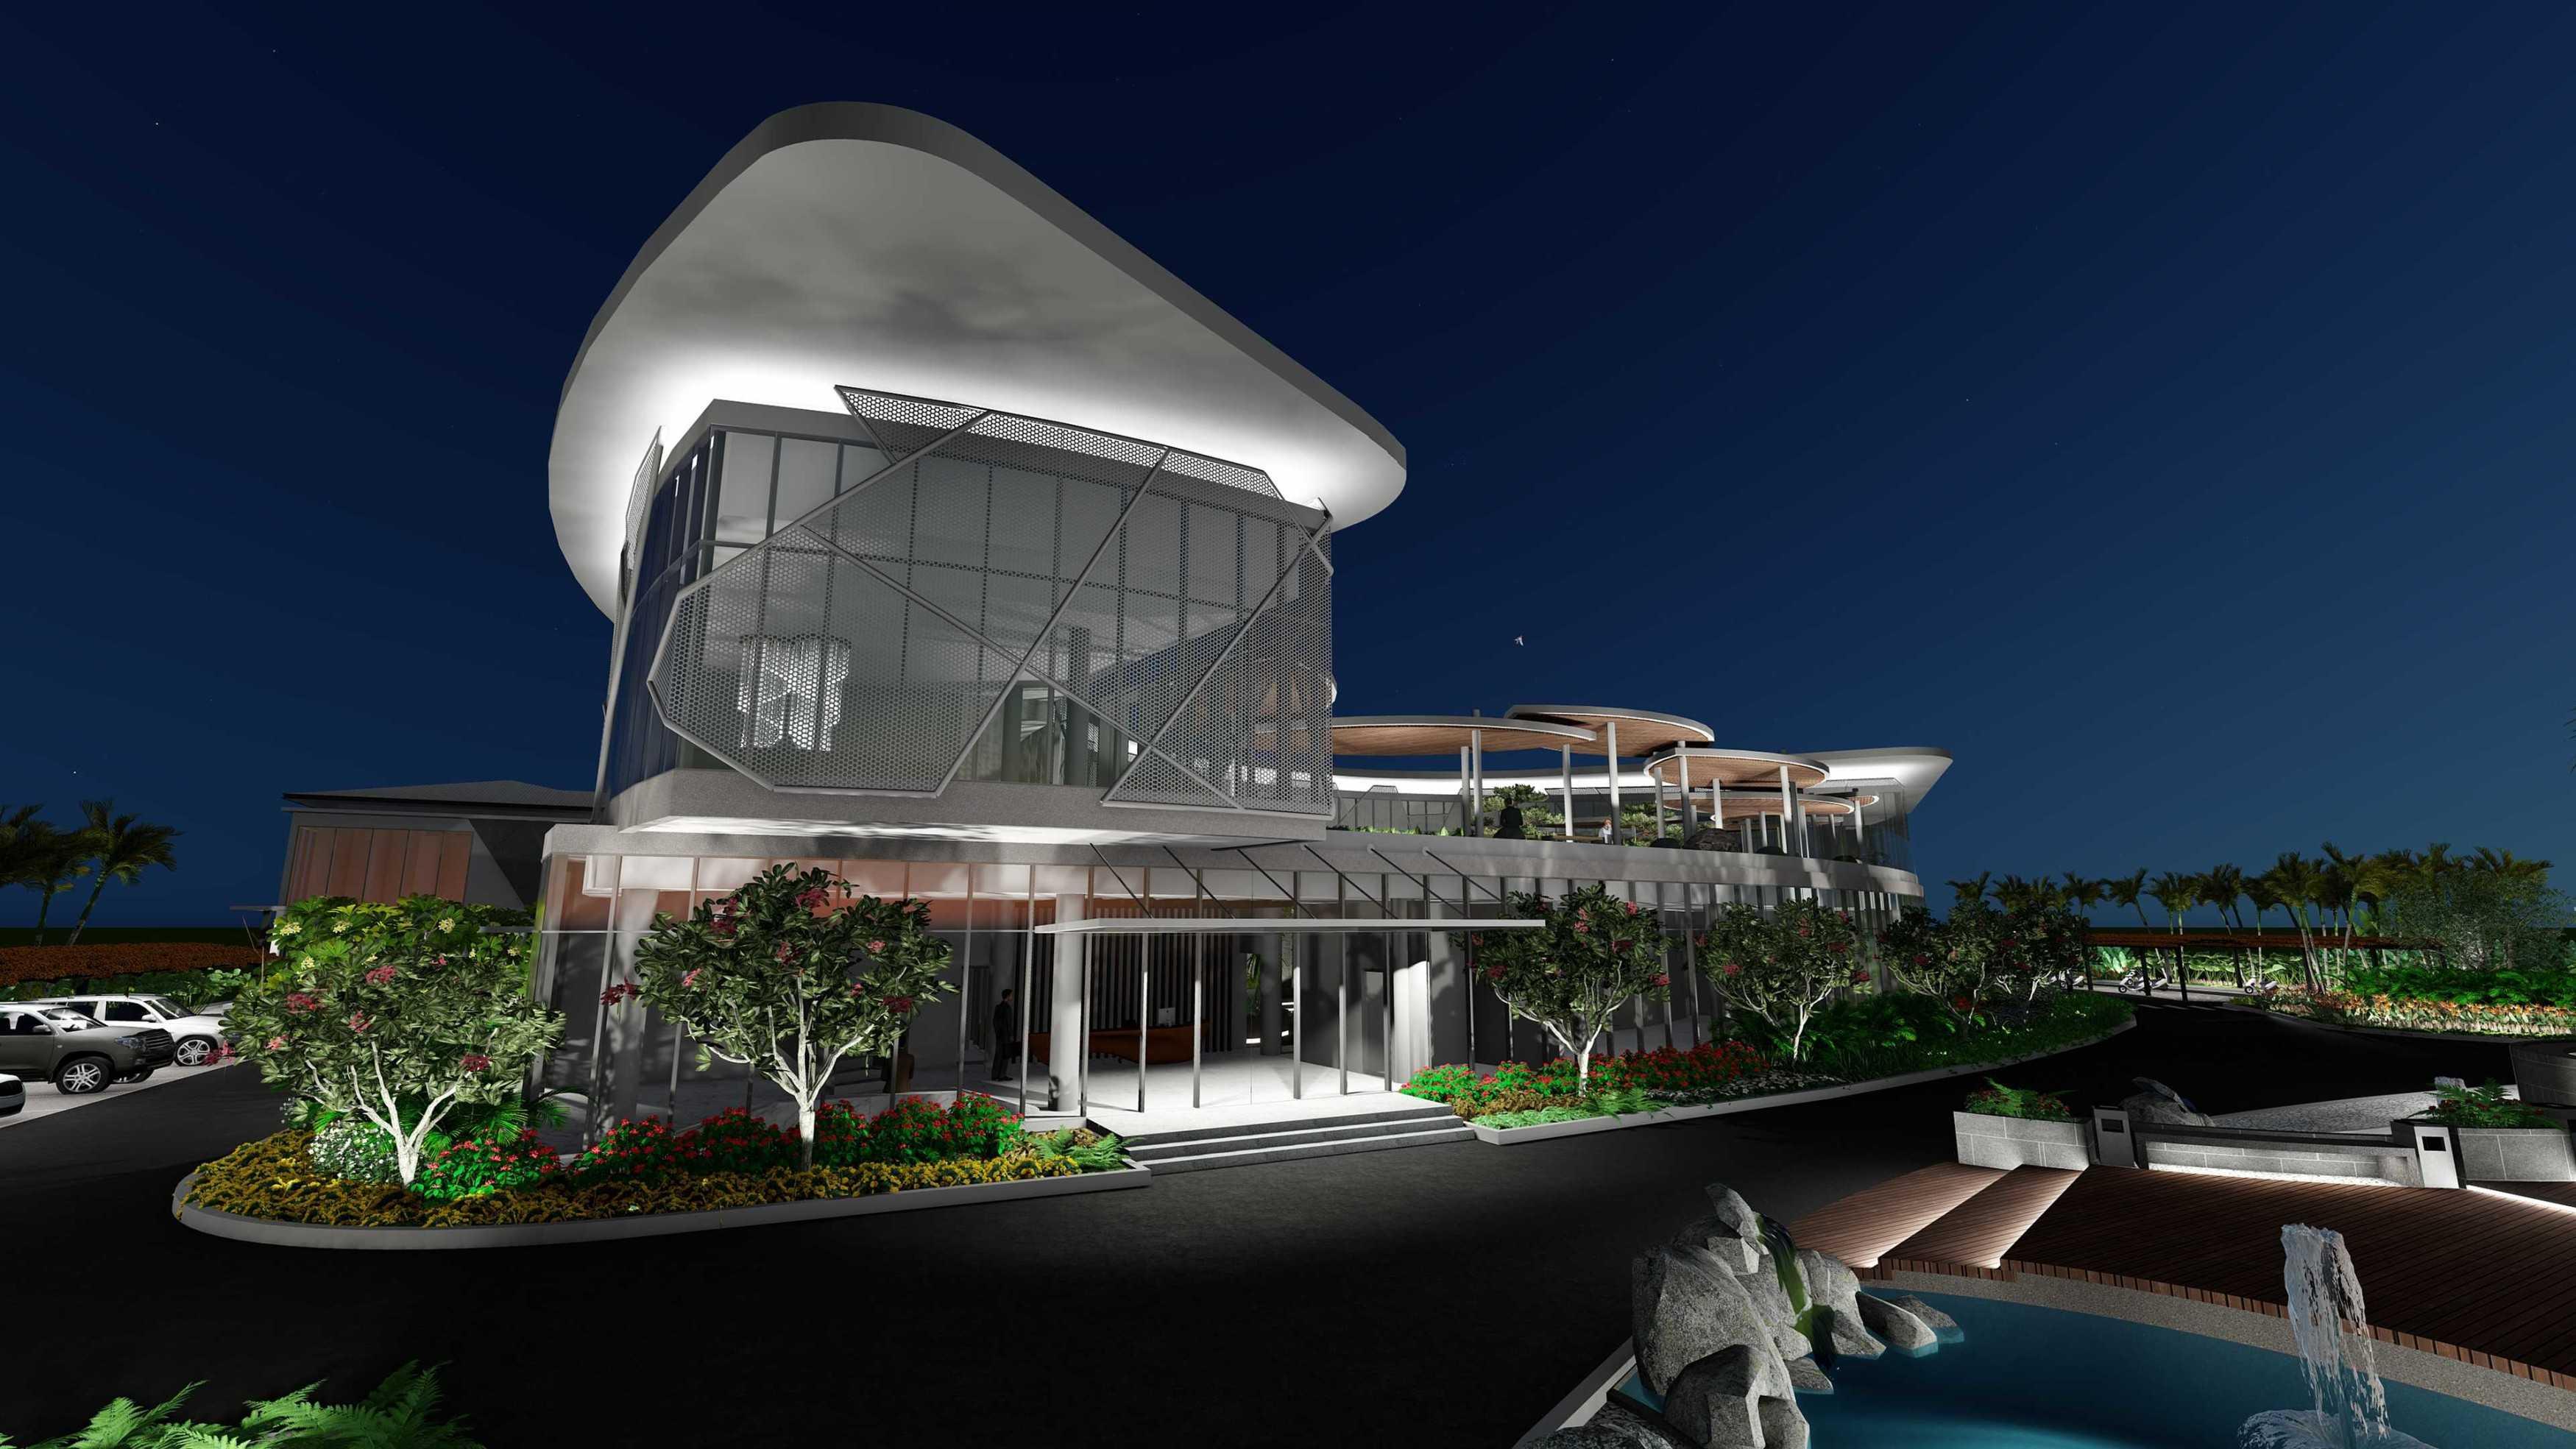 Raaj Gill Arsitek Aari Office Building & Laboratory #1 Pekanbaru, Kota Pekanbaru, Riau, Indonesia Pekanbaru, Kota Pekanbaru, Riau, Indonesia Raaj-Gill-Arsitek-Aari-Office-Building-Laboratory   74707